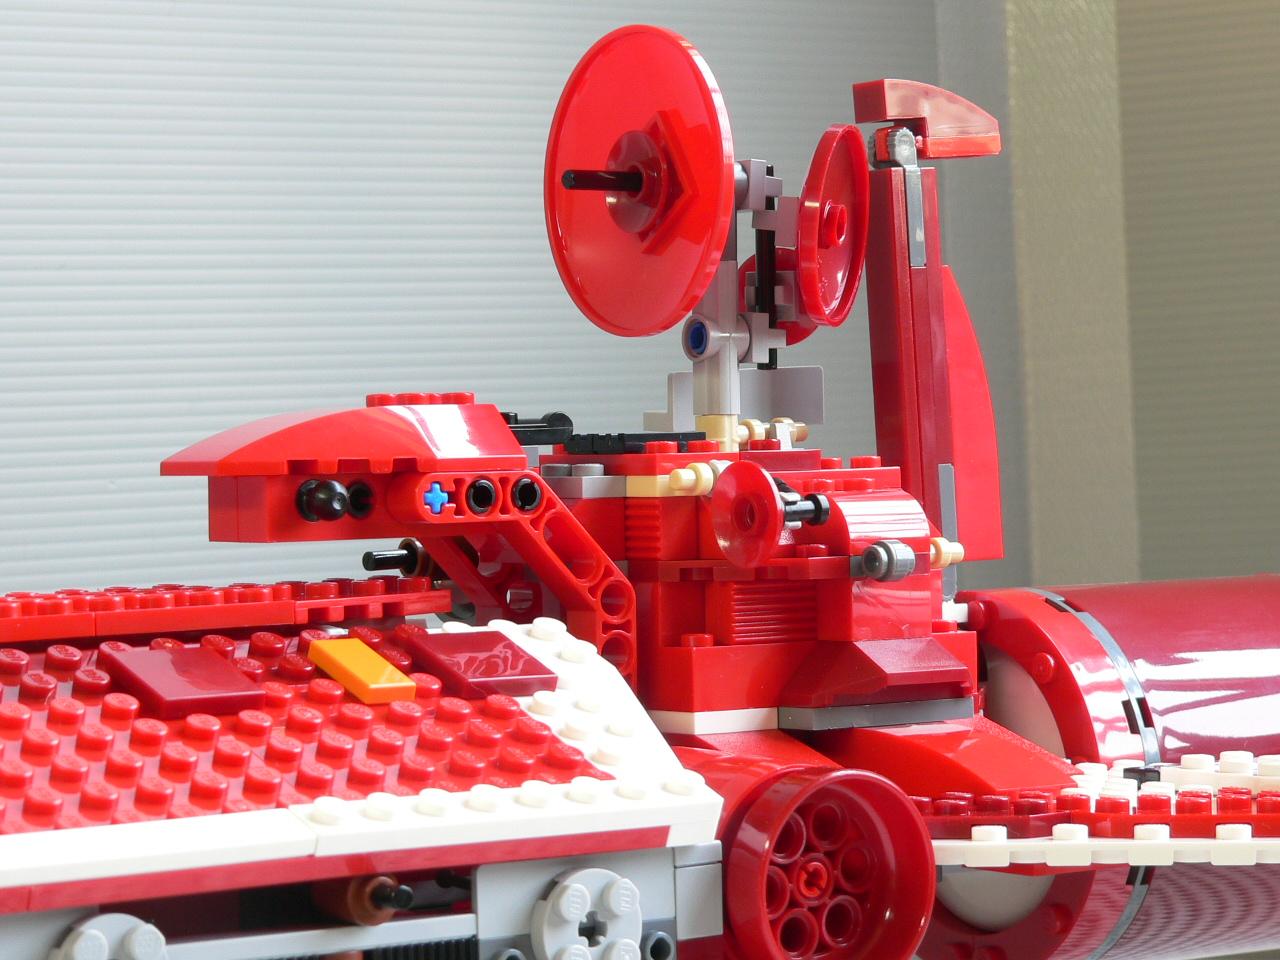 Star Wars Lego 7665 Republic Cruiser 02 A Photo On Flickriver